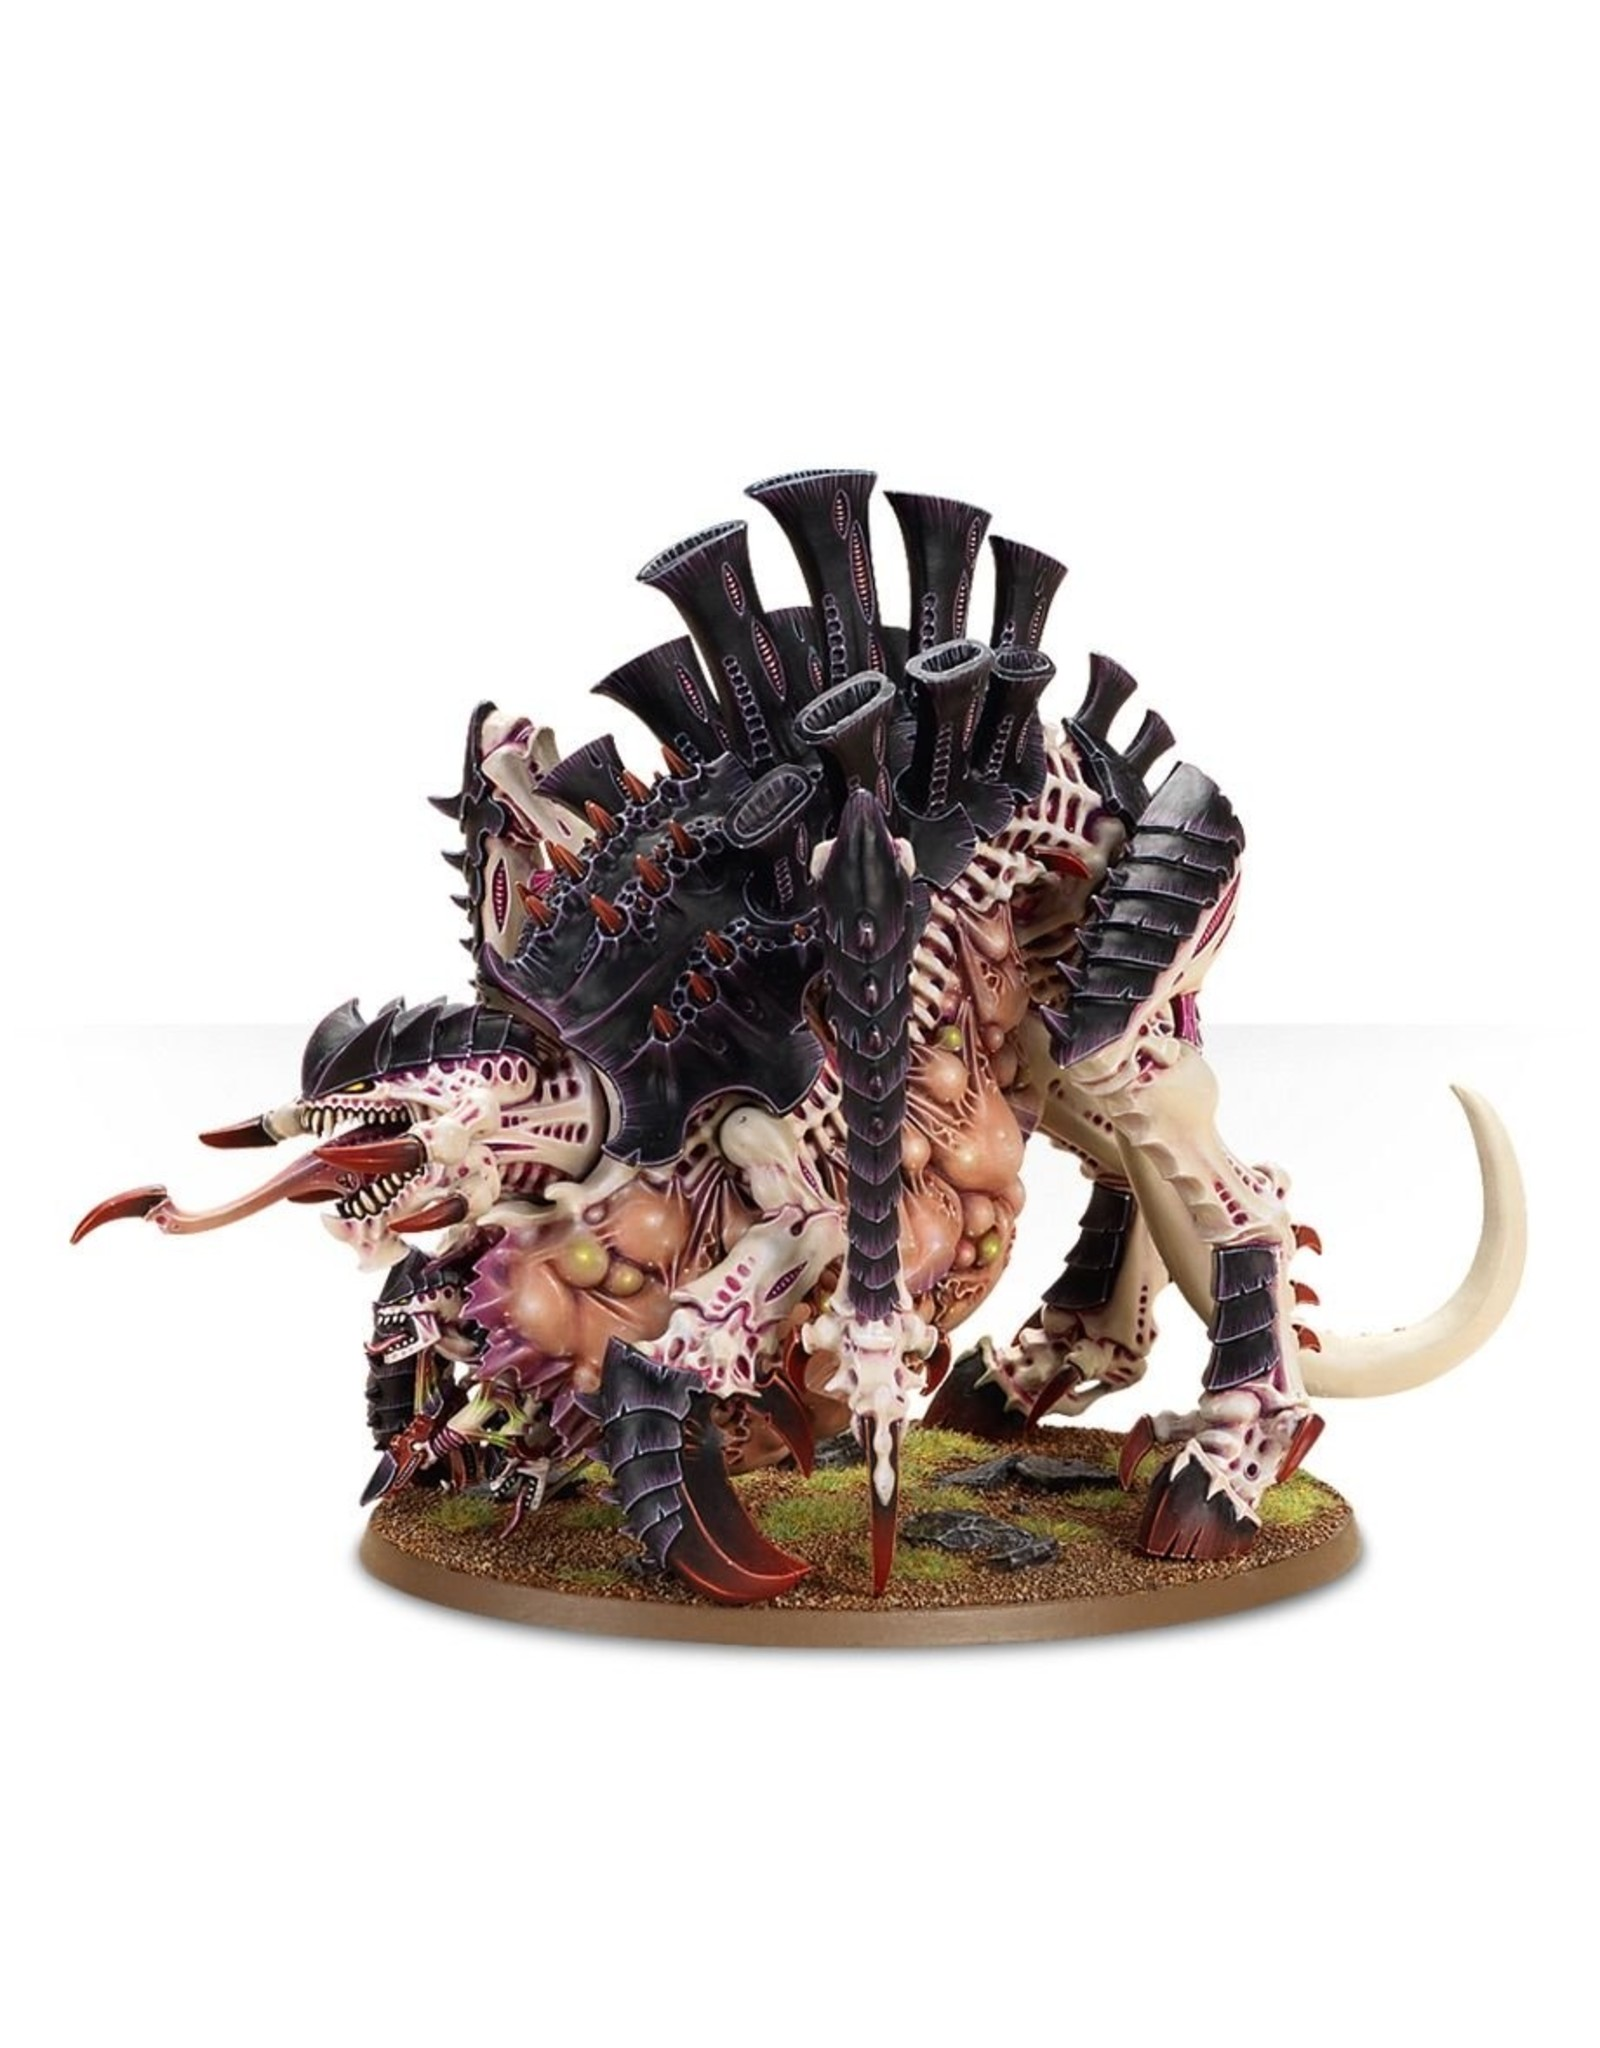 Games Workshop Tyranids: Tyrannofex/Tervigon